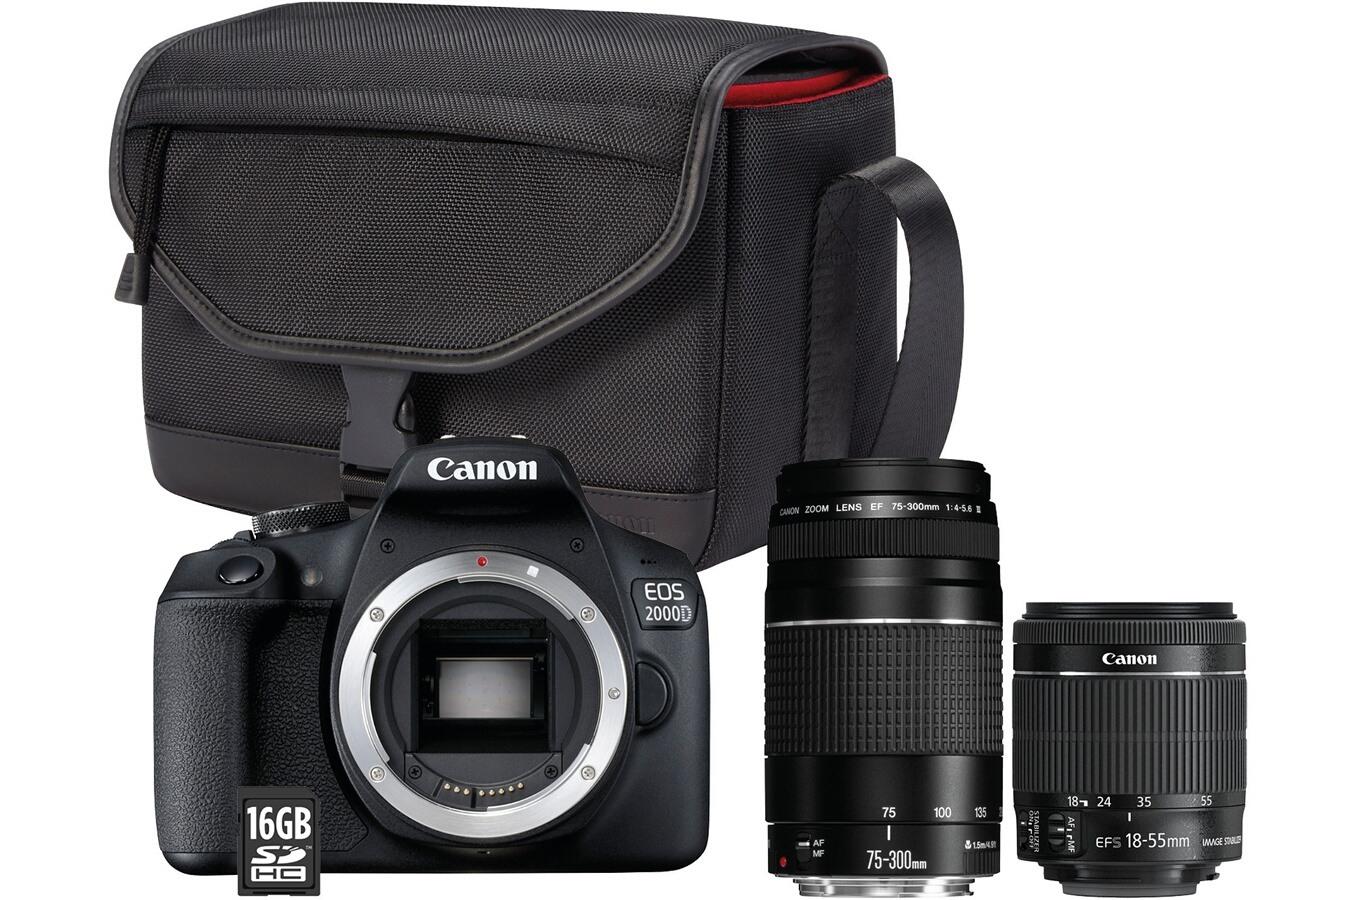 Appareil photo Reflex Canon EOS 2000D + 2 Objectifs (18-55 mm + 75-300 mm f/4-5.6) + Sac + Carte SD 16 Go